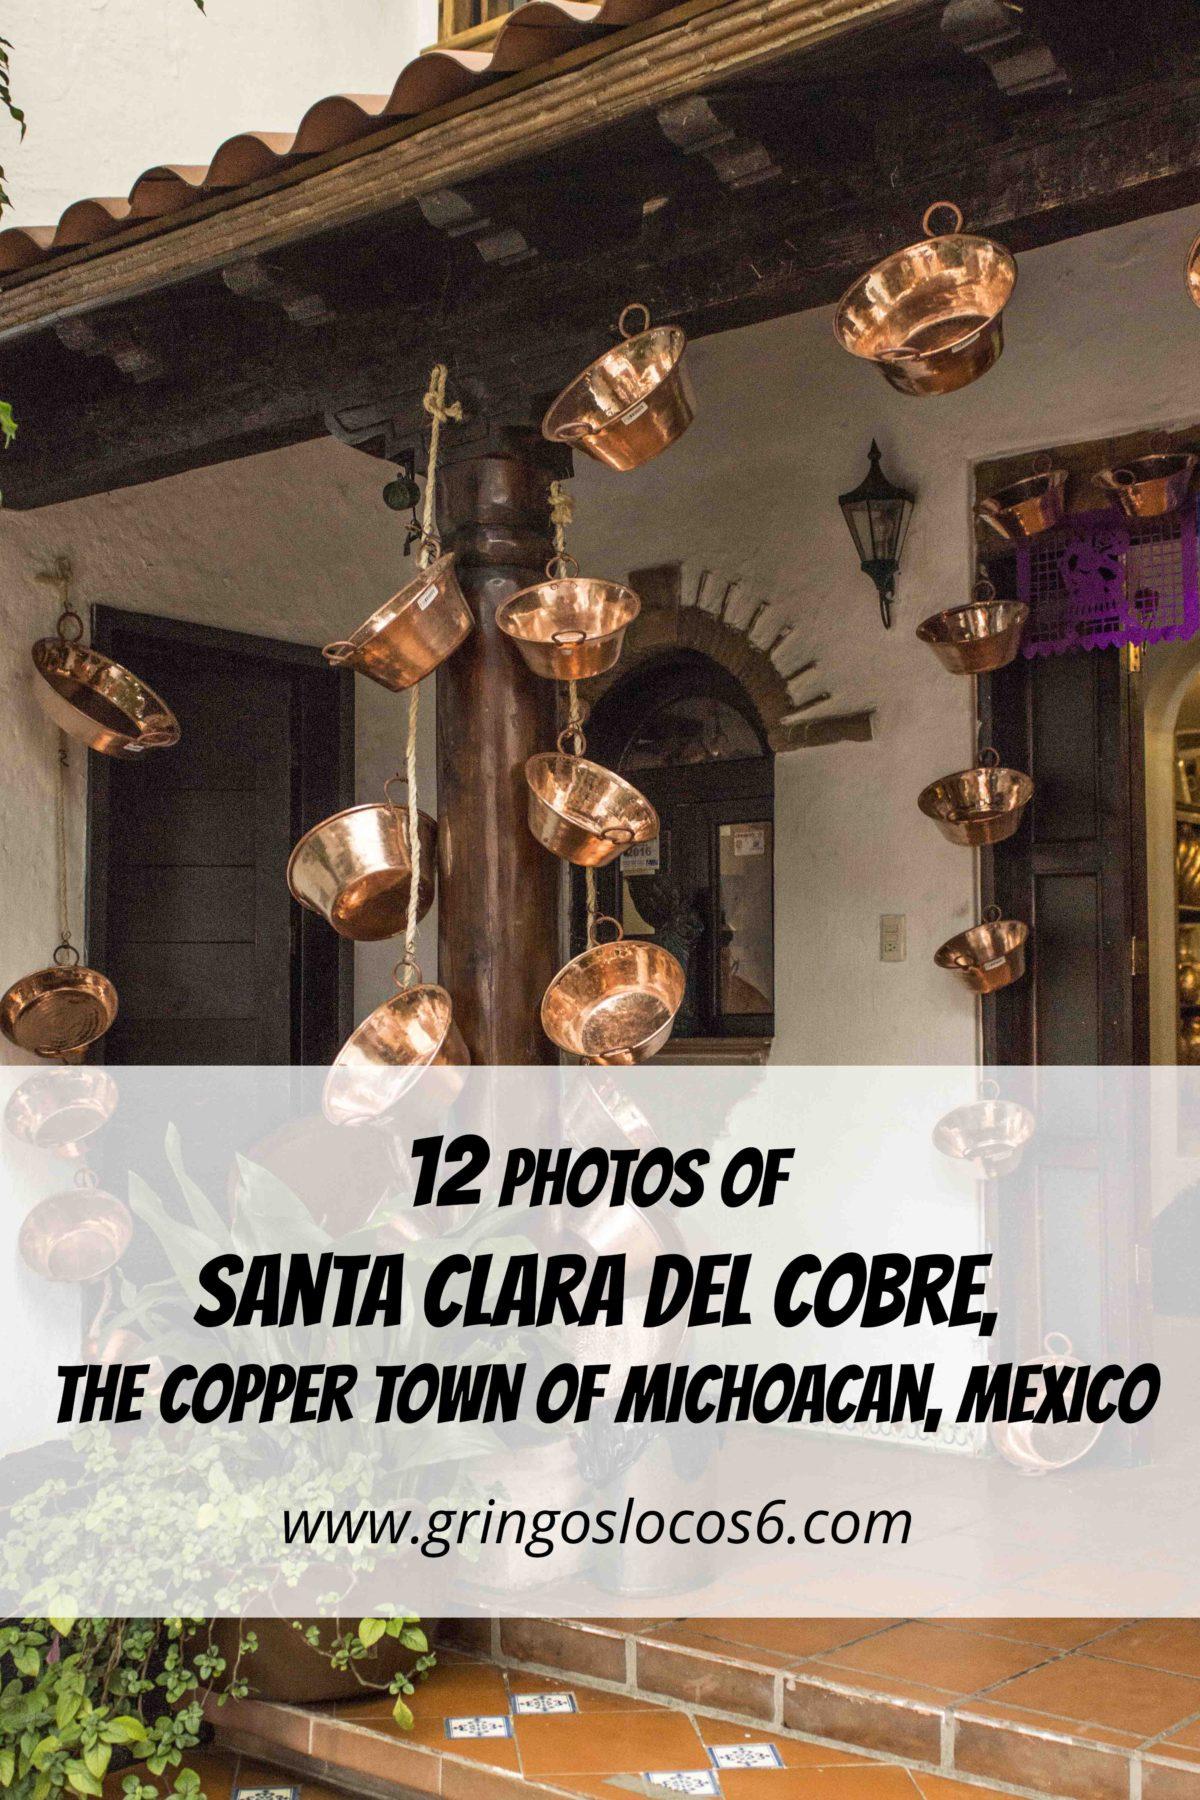 Santa Clara del Cobre is a small town in Michoacan, Mexico that is famous for copper, (cobre means copper).